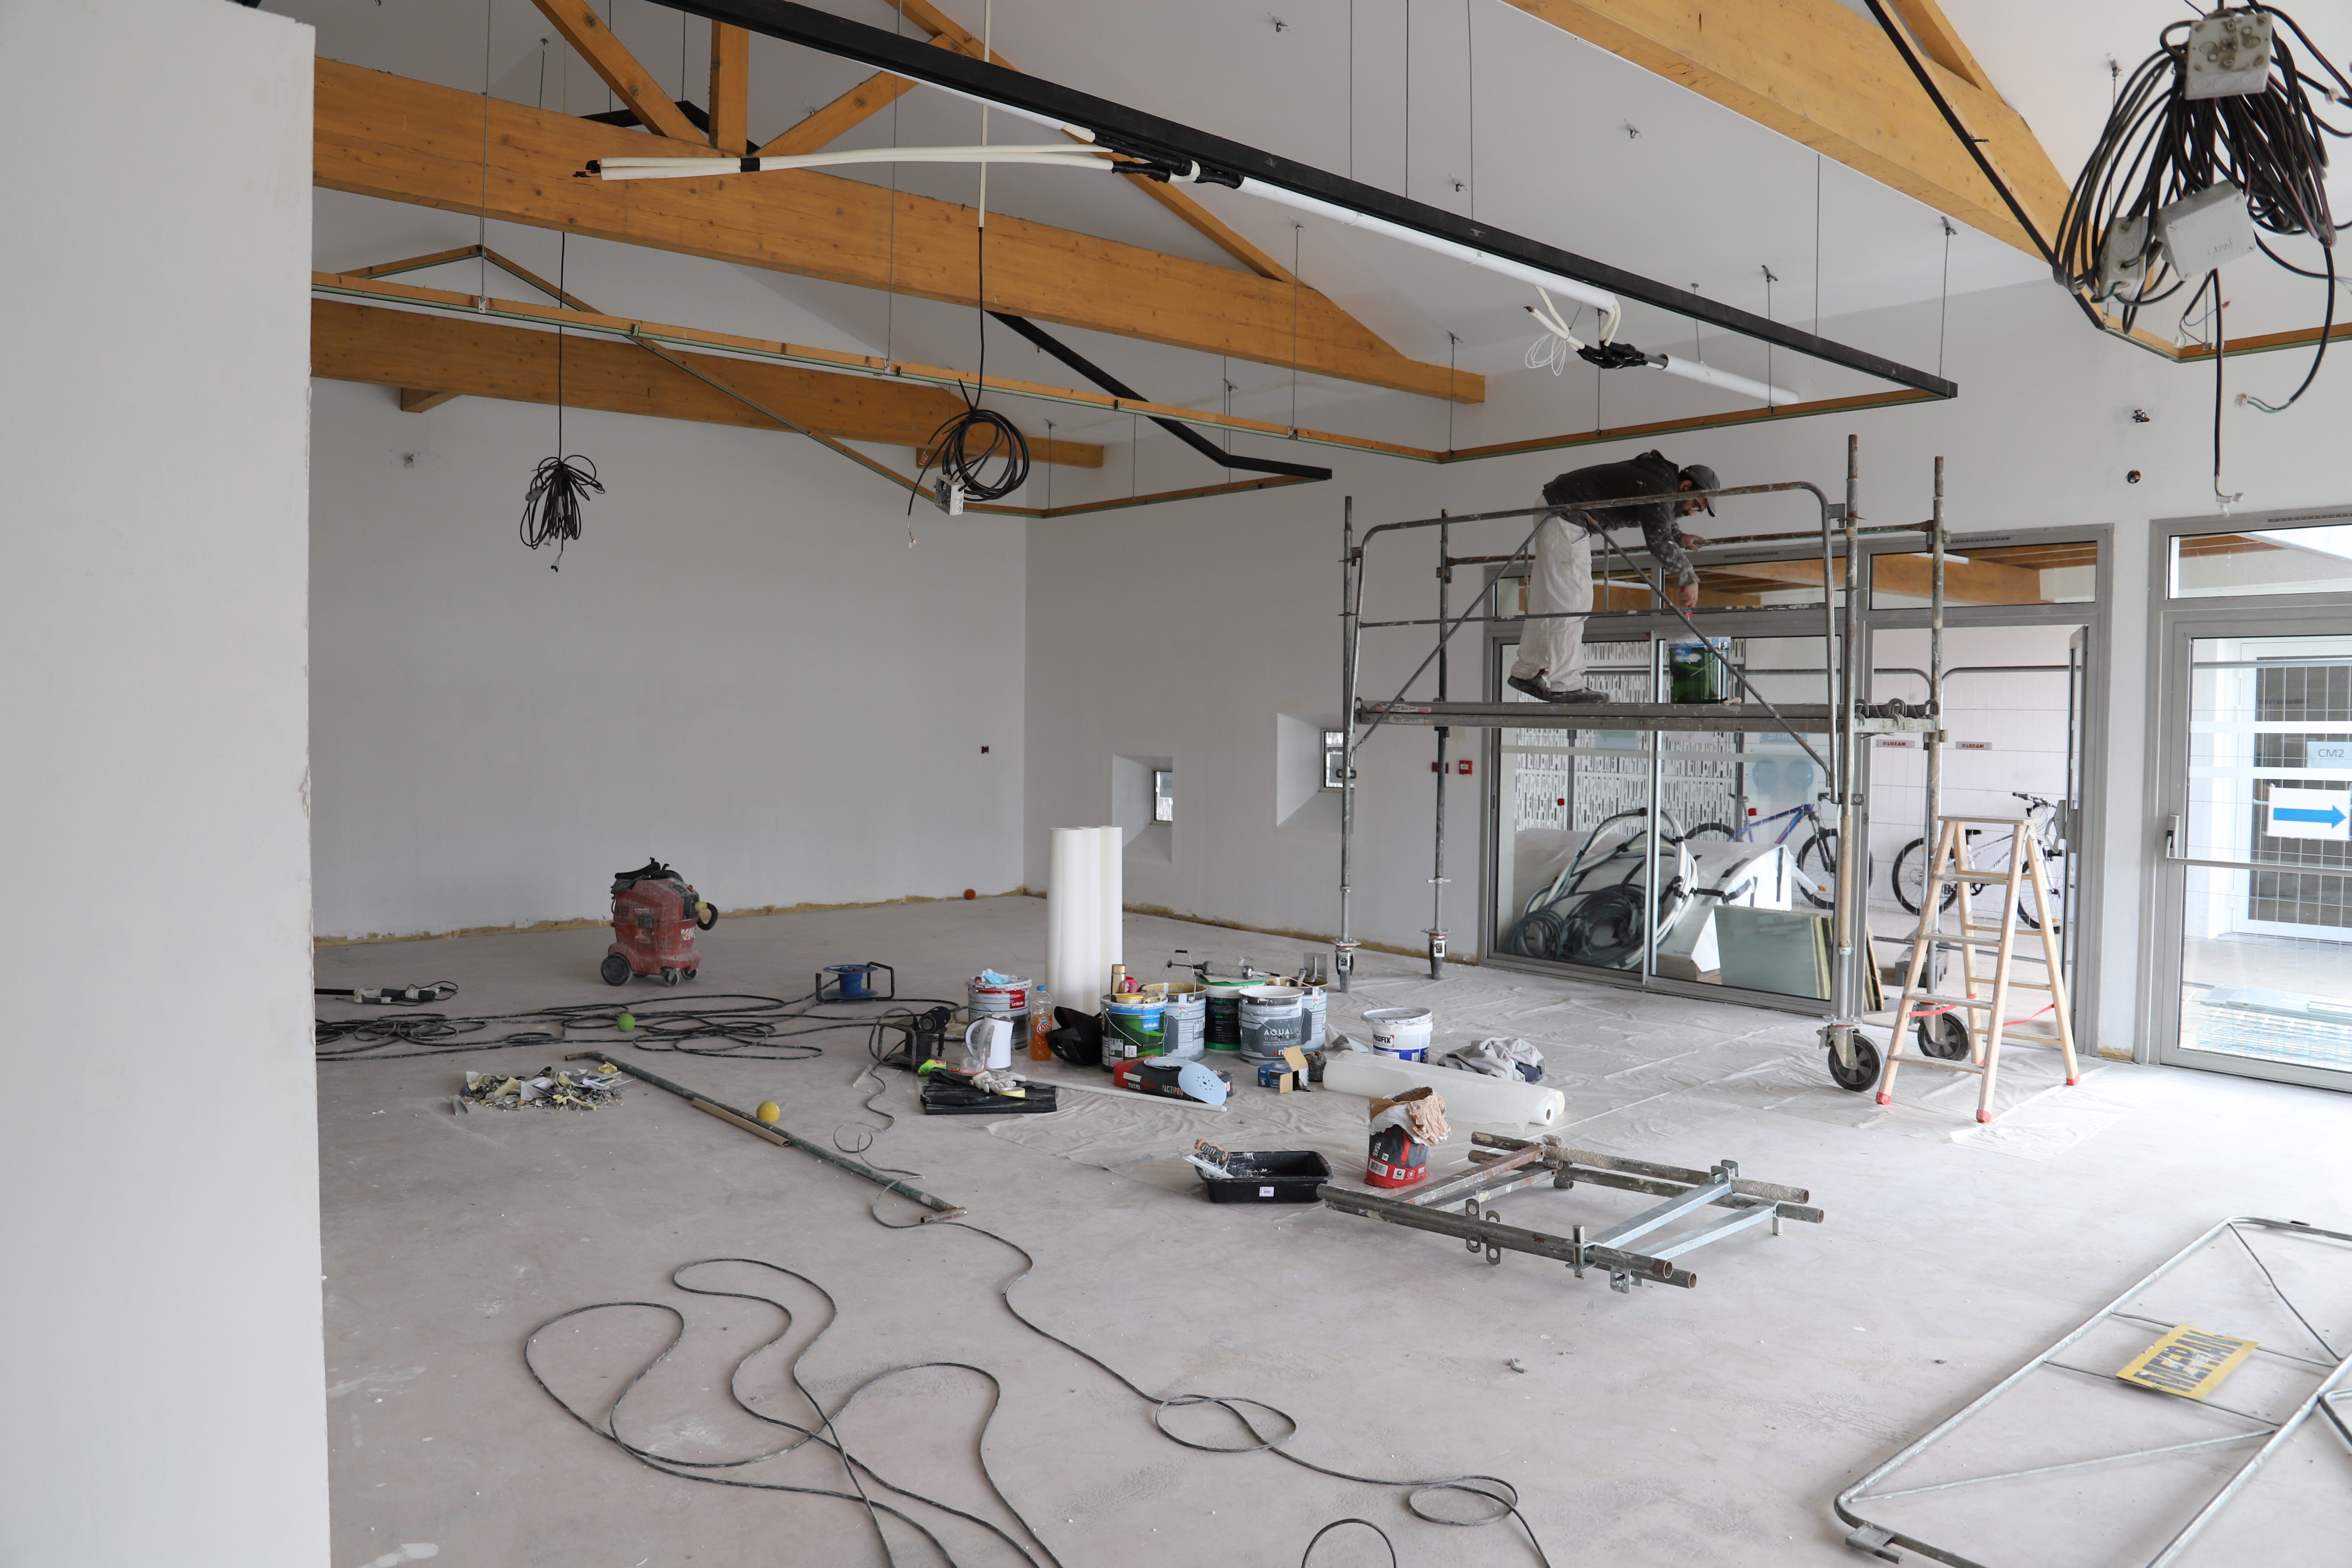 2021_02 rénovation salle d_activité 3.JPG